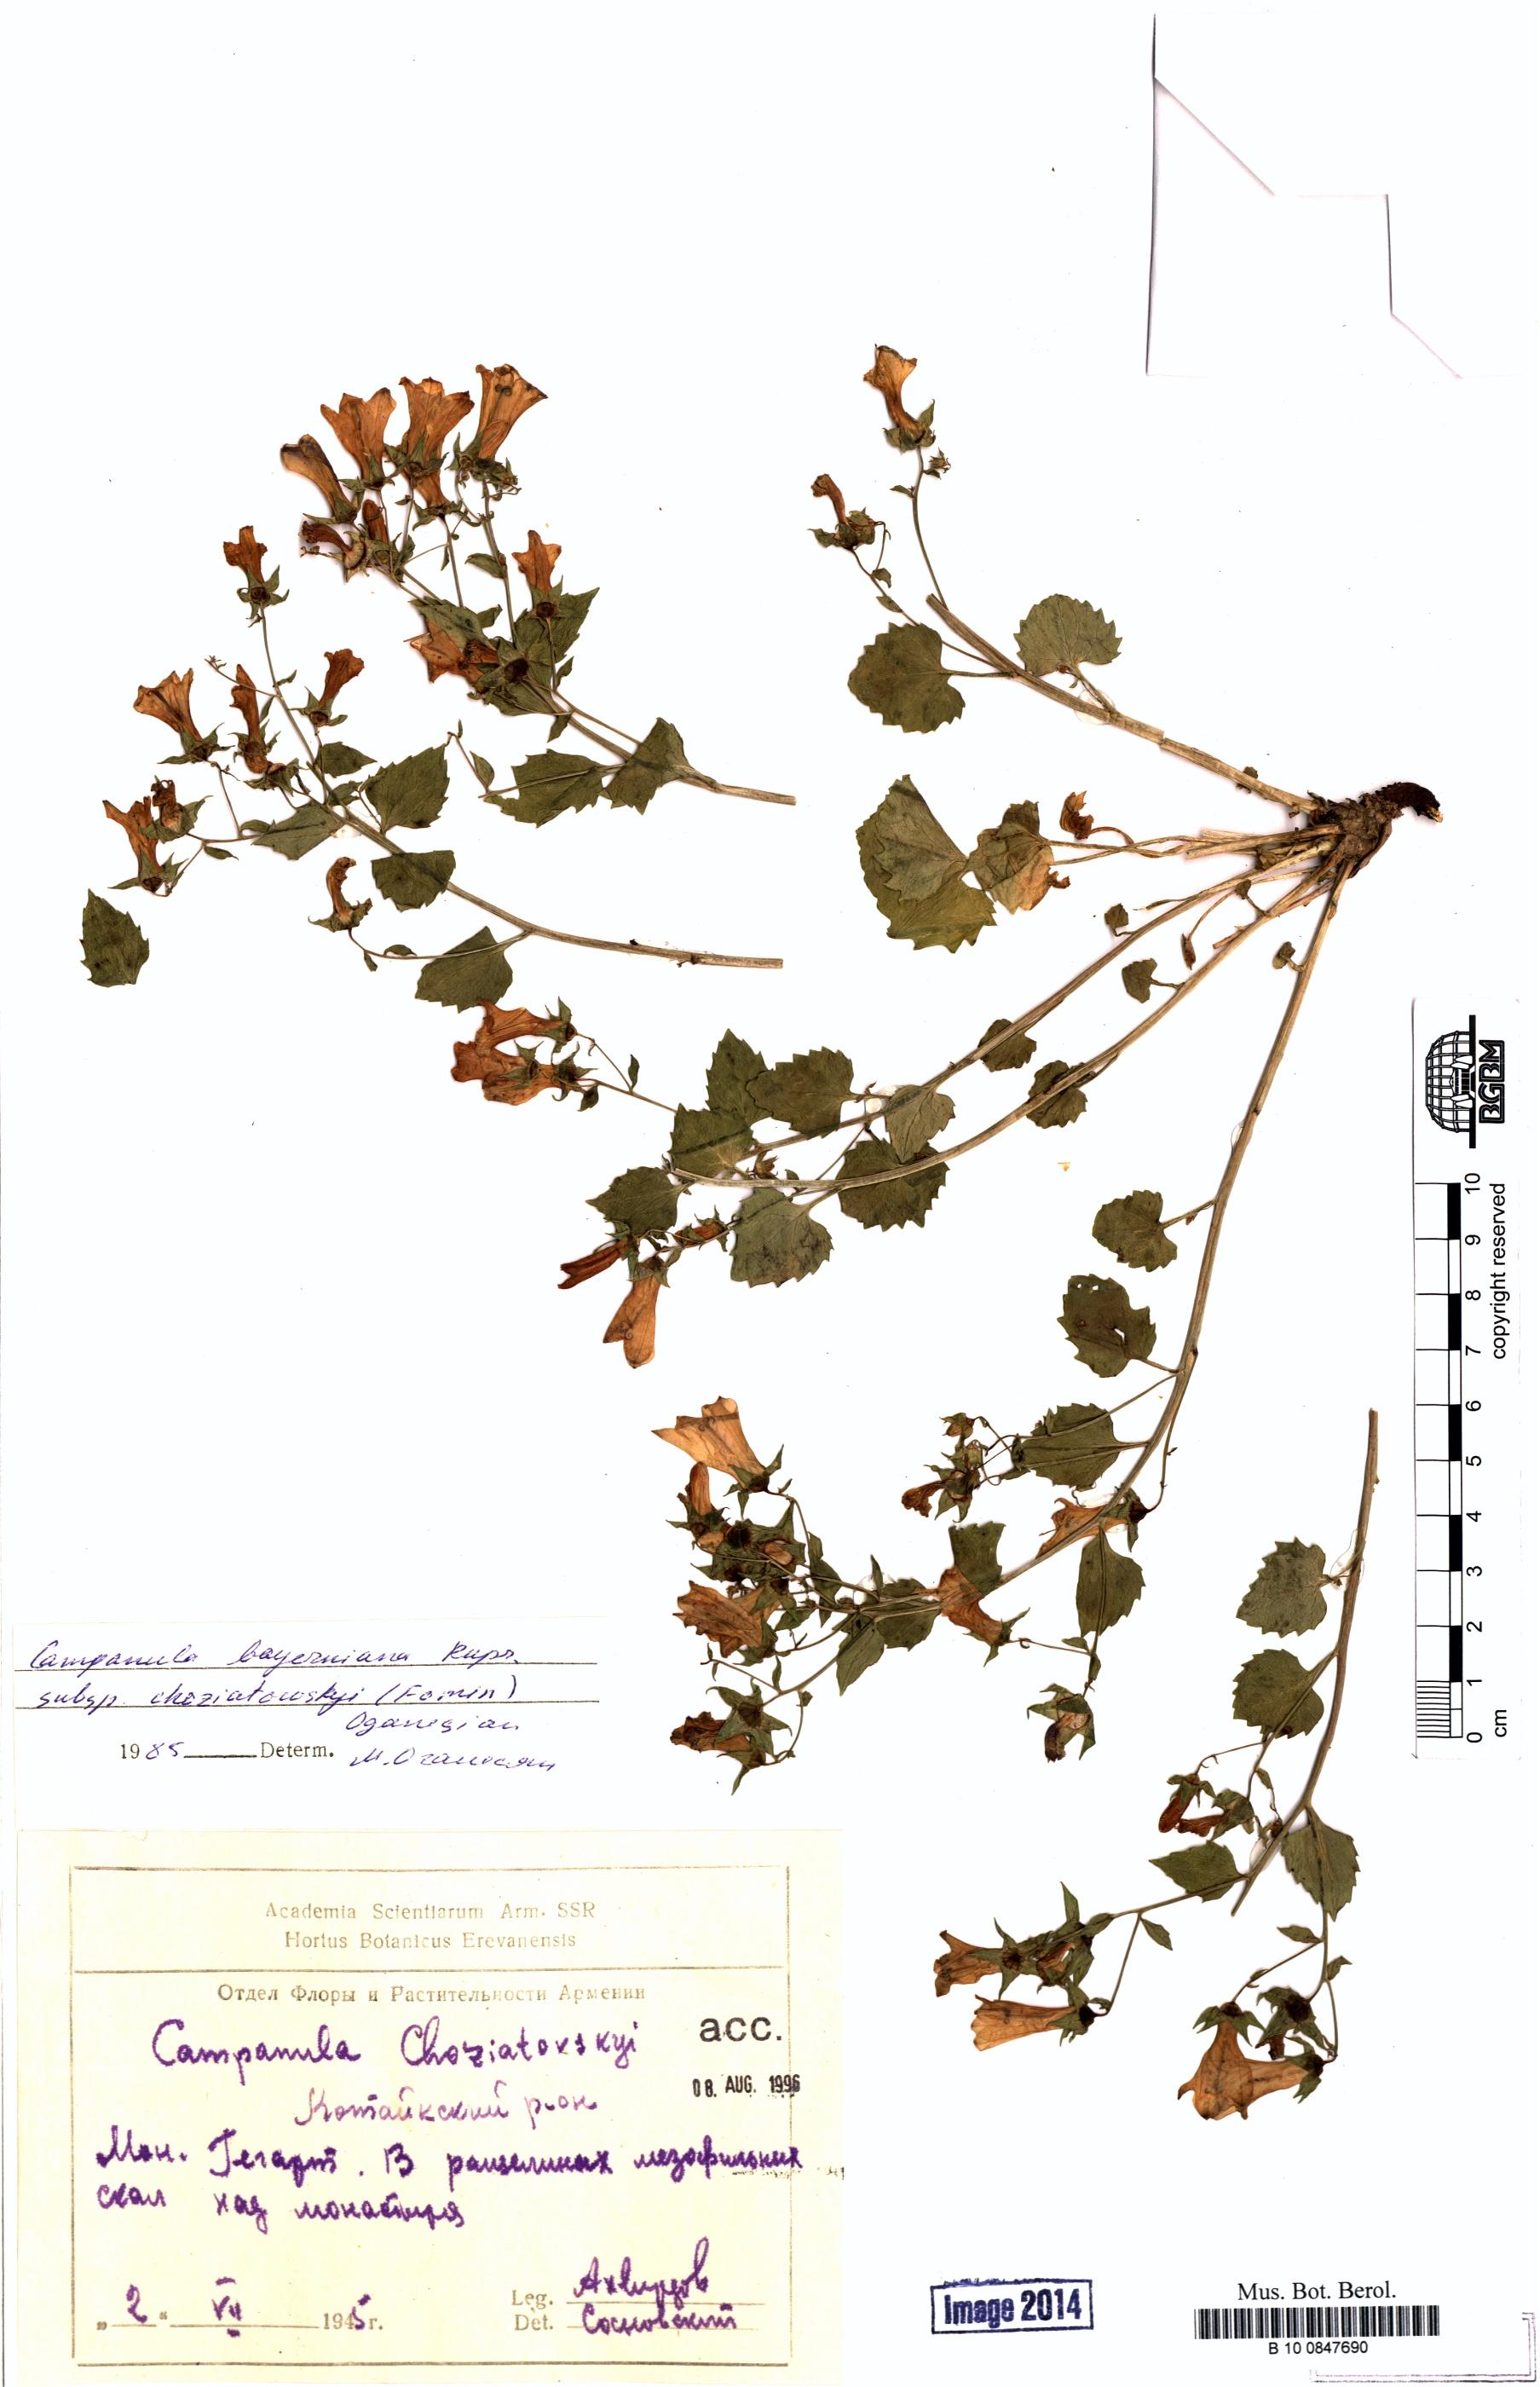 http://ww2.bgbm.org/herbarium/images/B/10/08/47/69/B_10_0847690.jpg